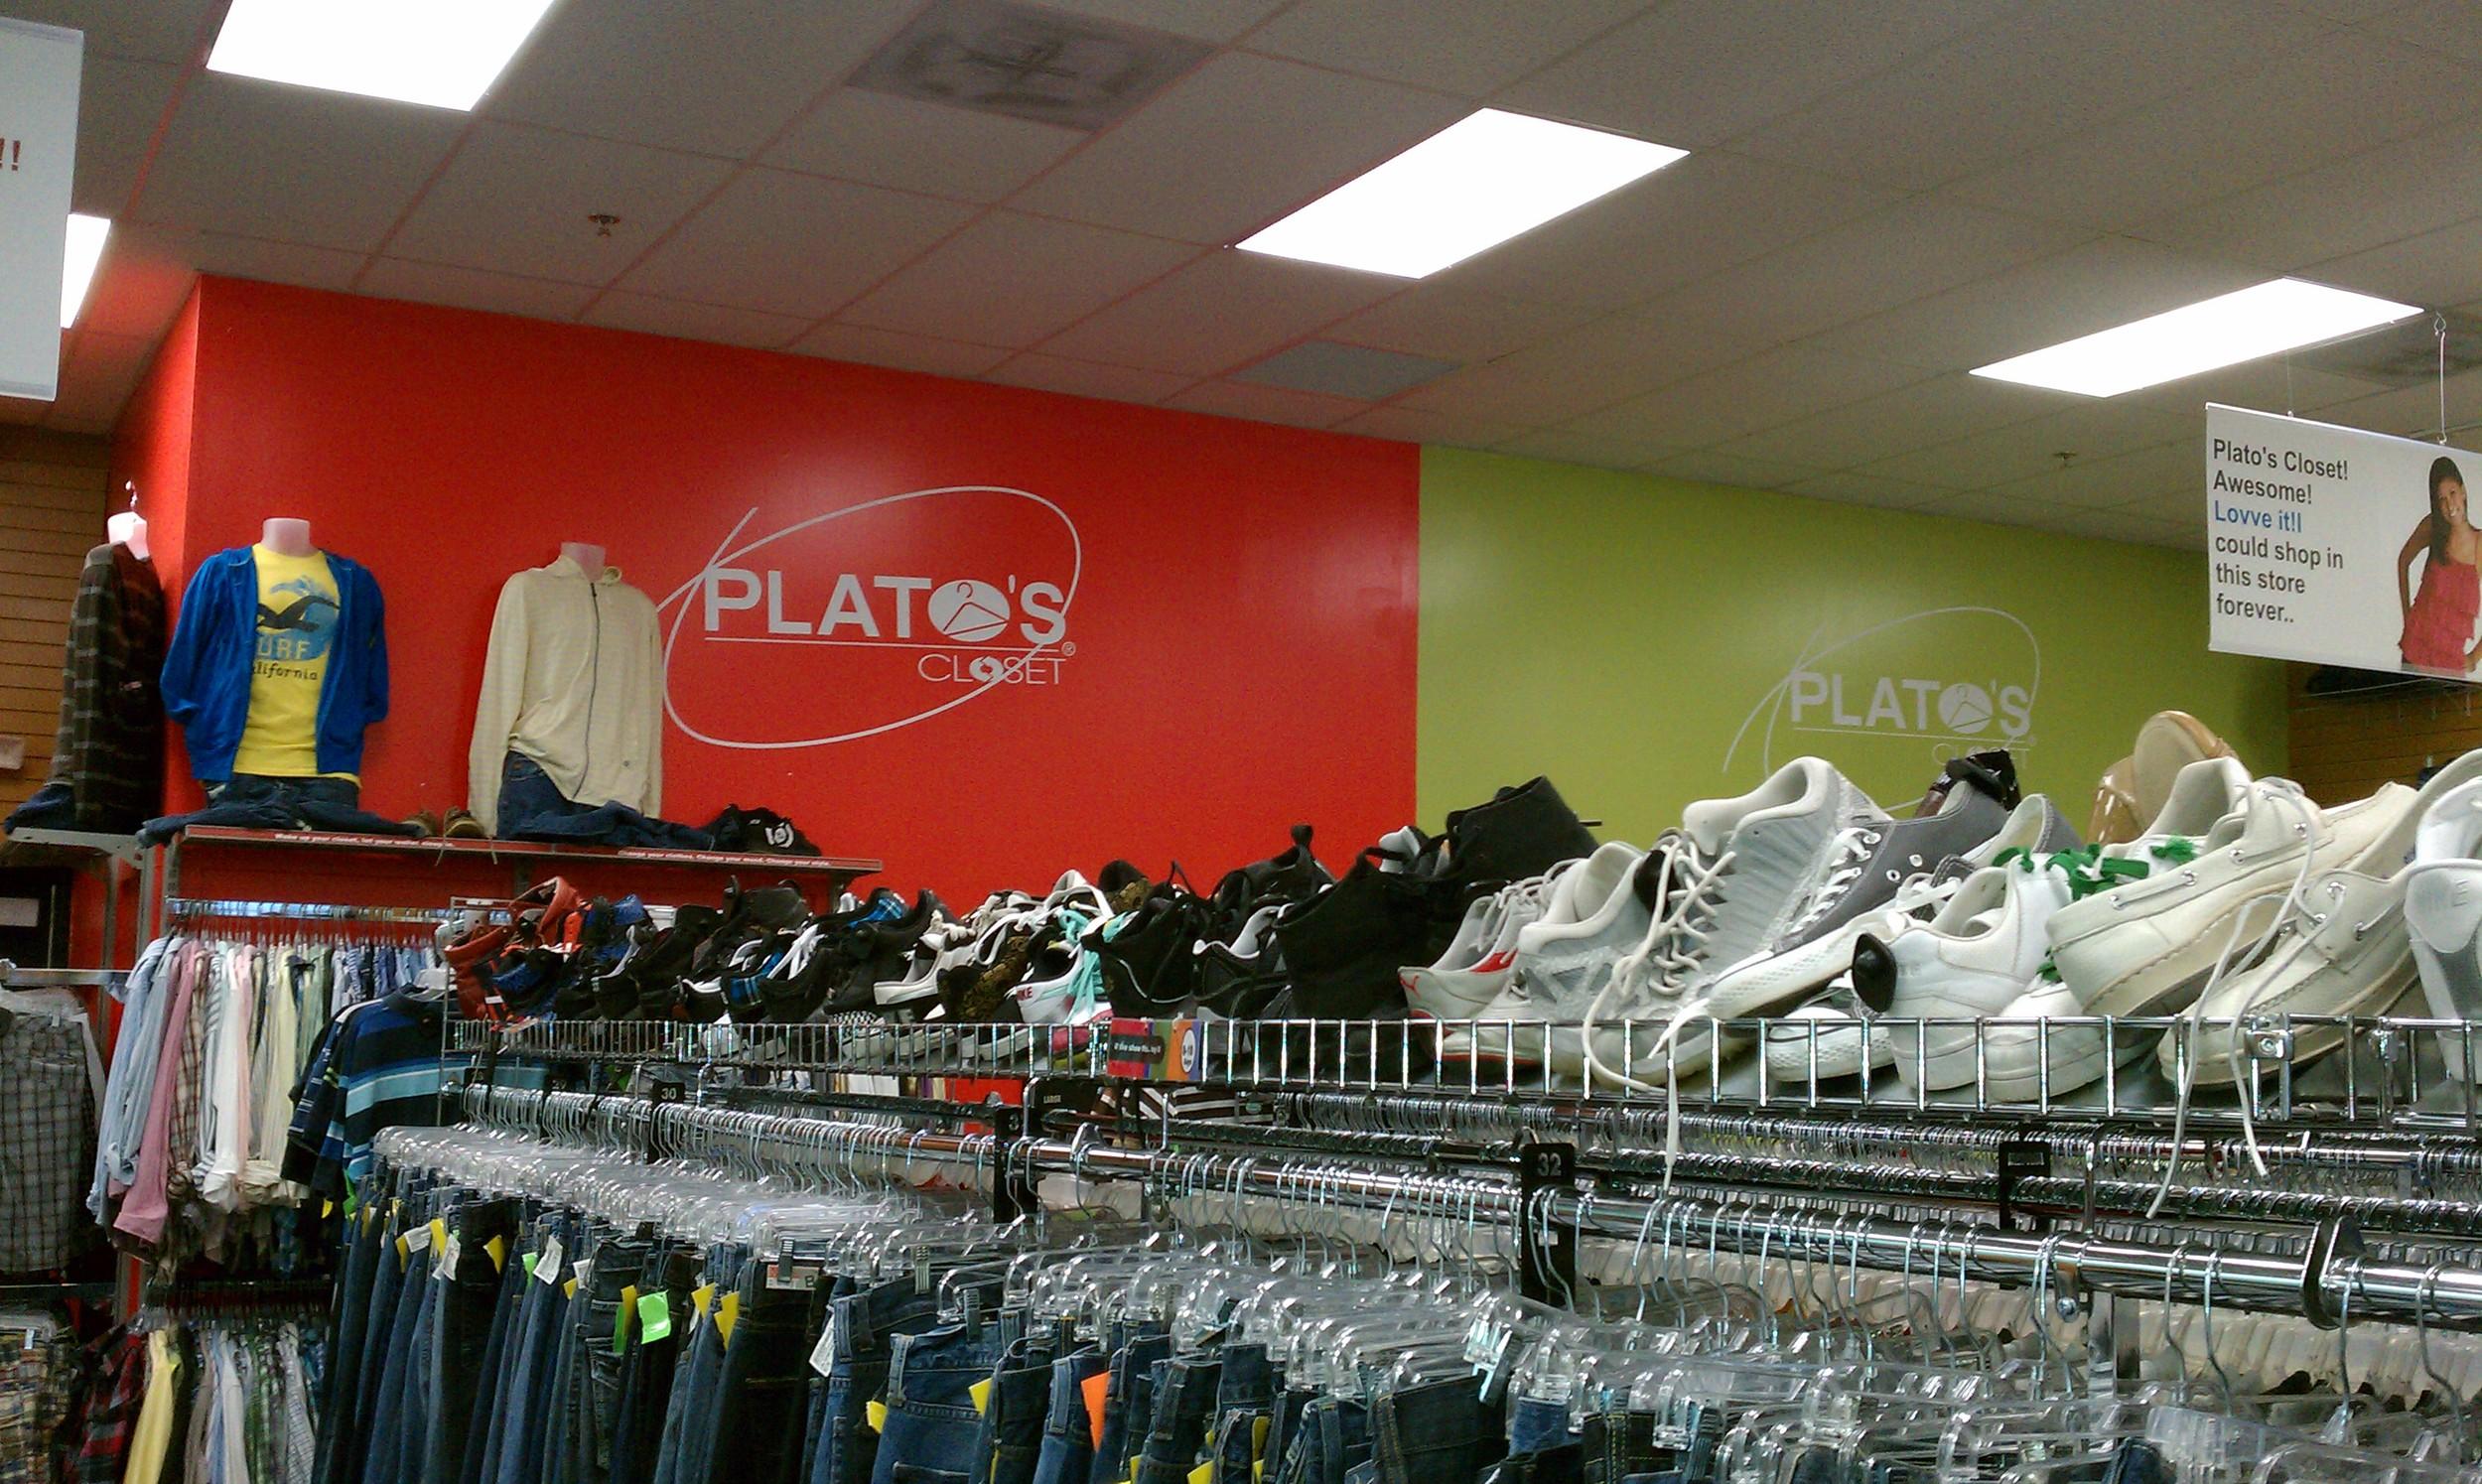 Plato's Closet, Jacksonville, FL R&R Construction, INc.  Metal Framing Exterior Sheathing, Drywall, Acoustical Ceilings, Carpentry